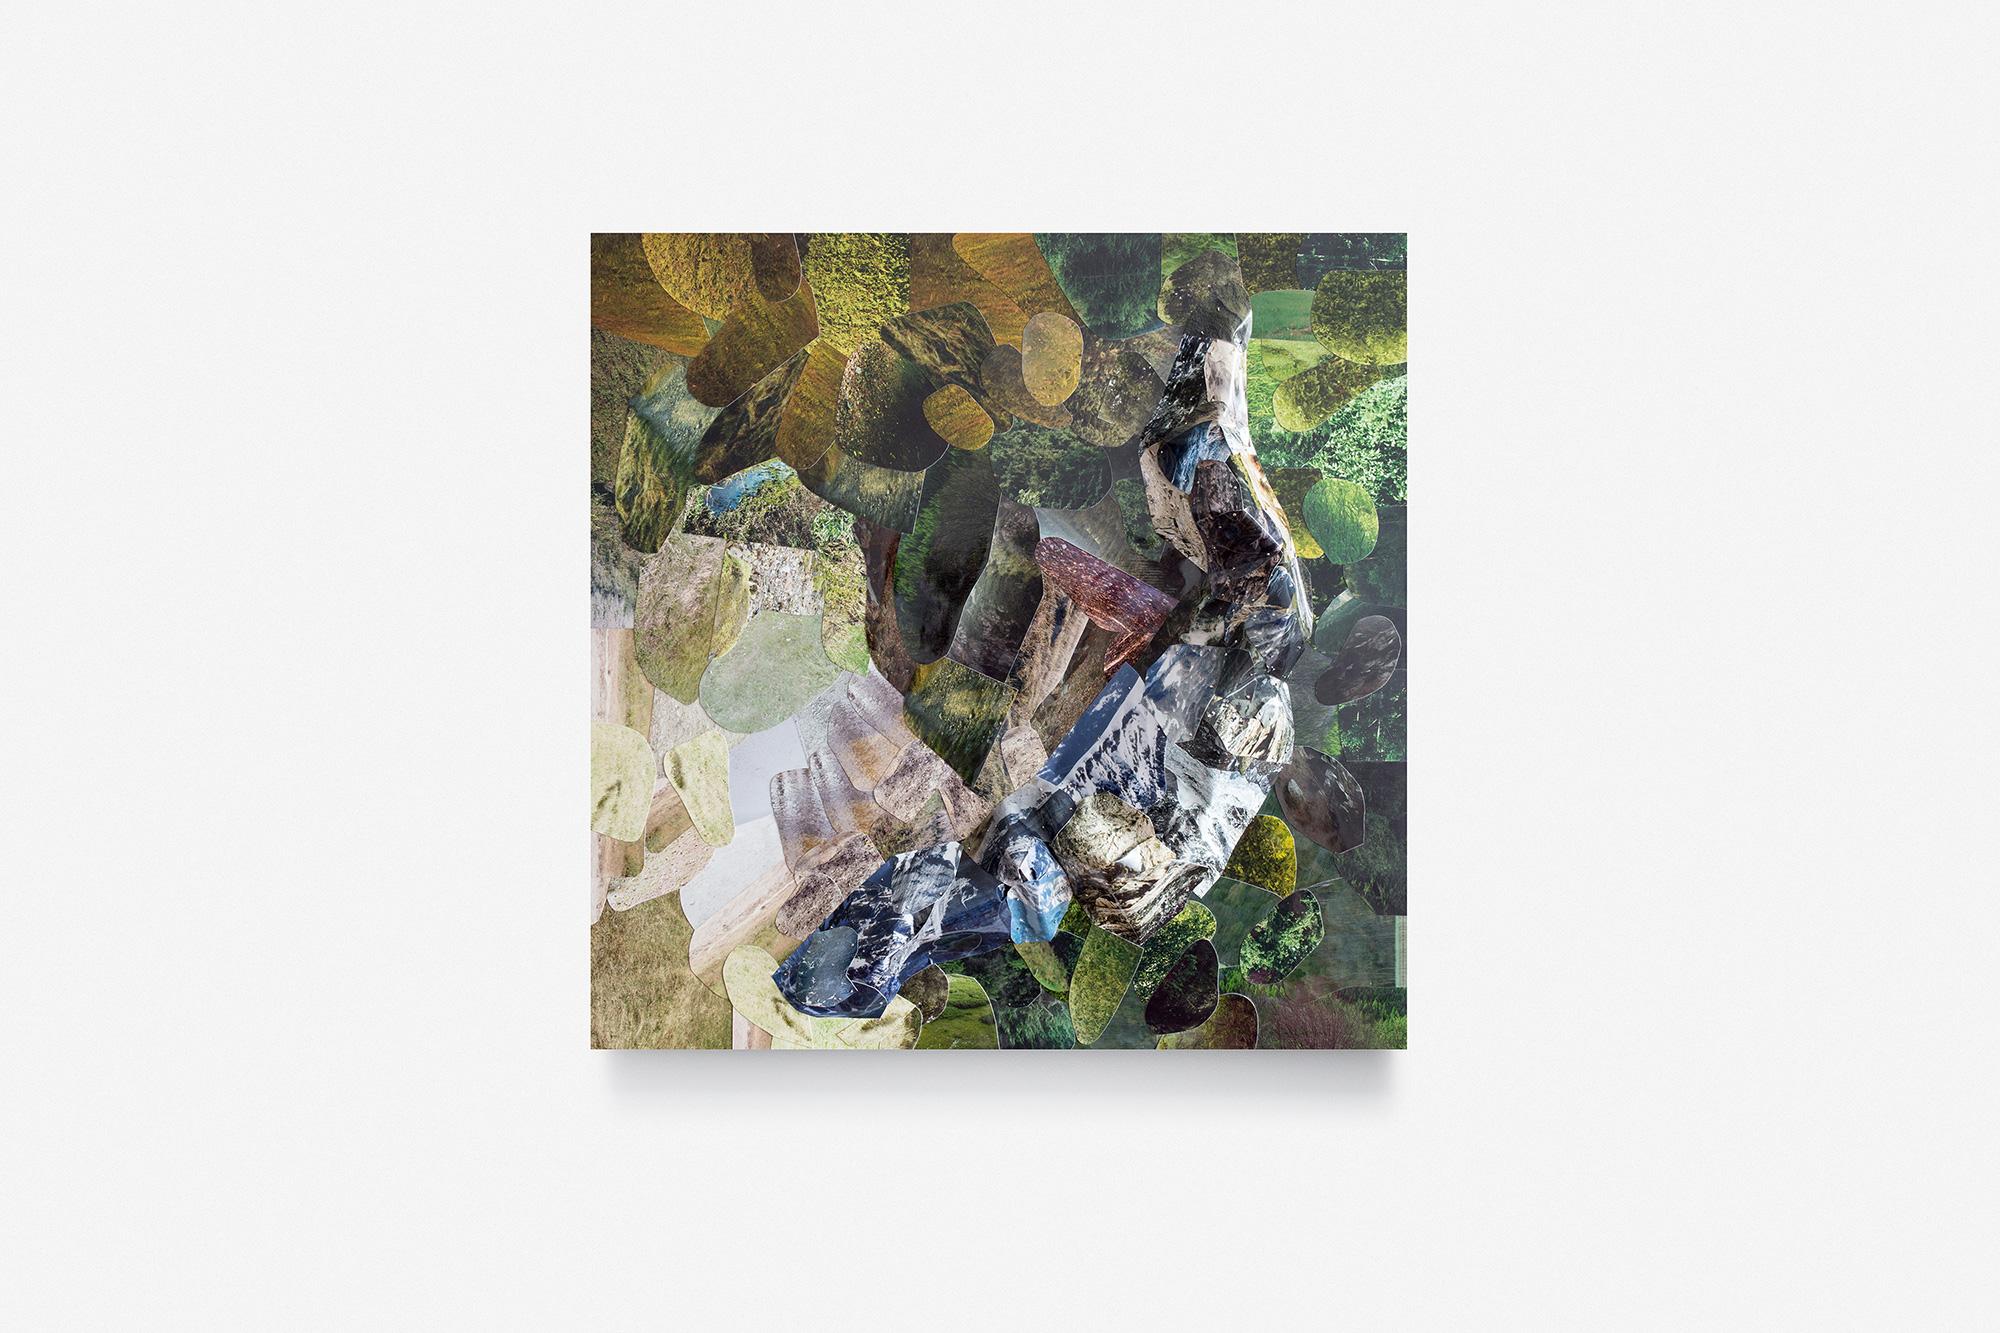 Ewa Doroszenko – Impossible Territory 03, photographic object